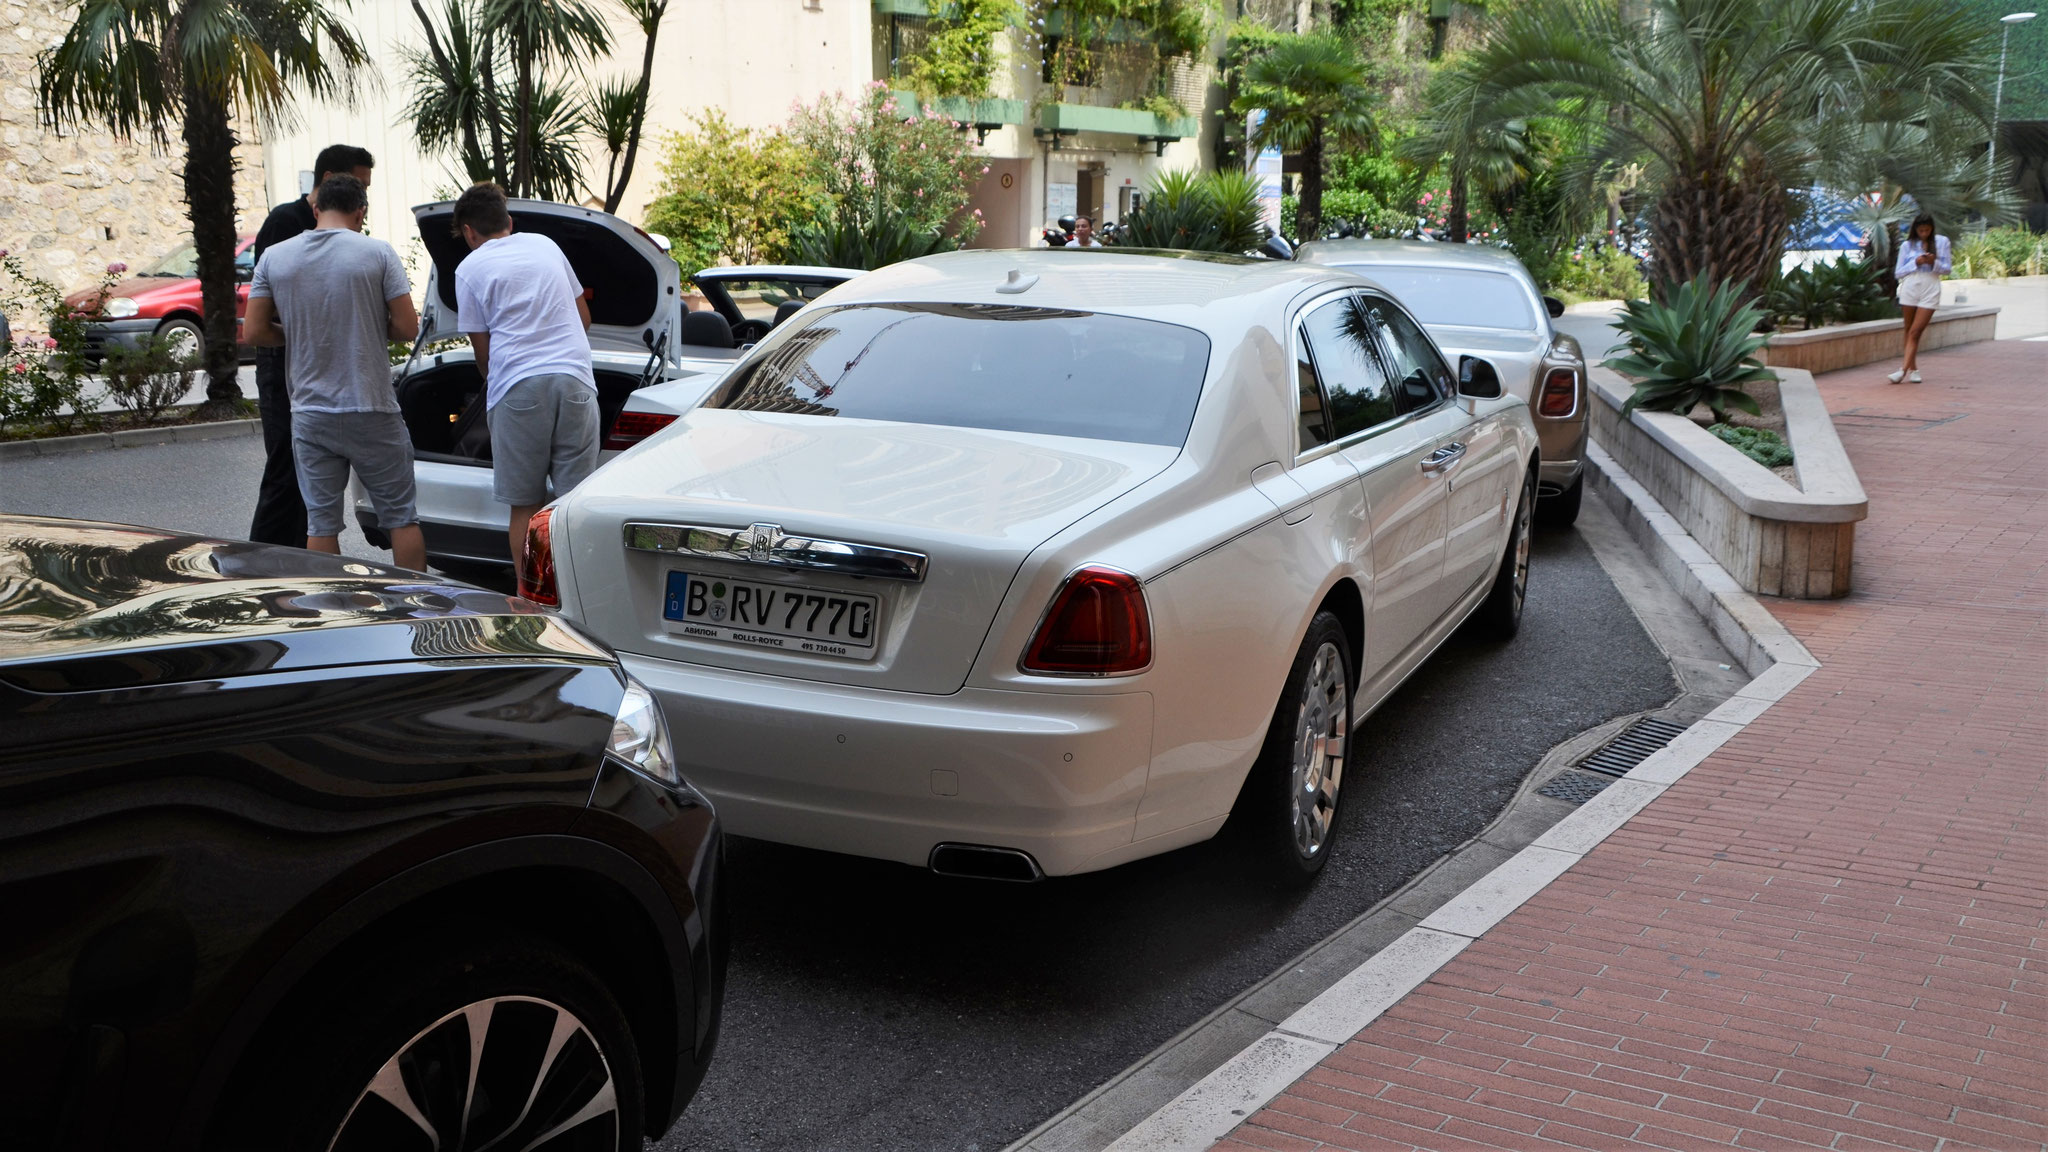 Rolls Royce Ghost Series II - B-RV-7770